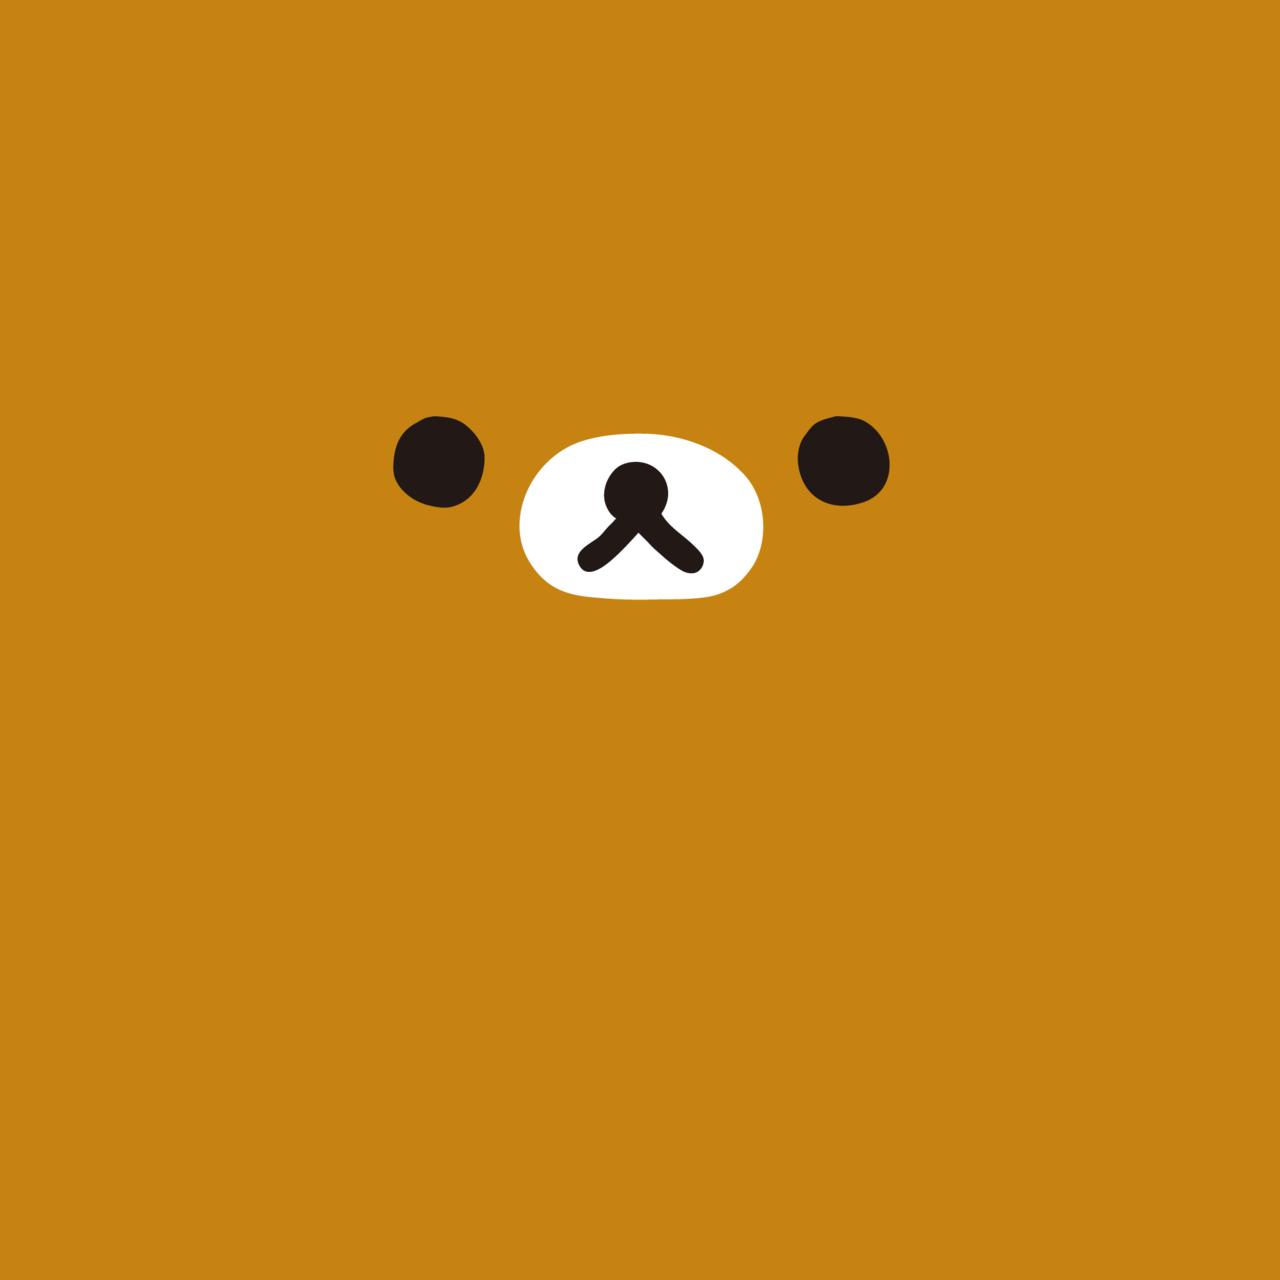 Orange iphone wallpaper tumblr - Tumblr Wallpapers C Utare Google